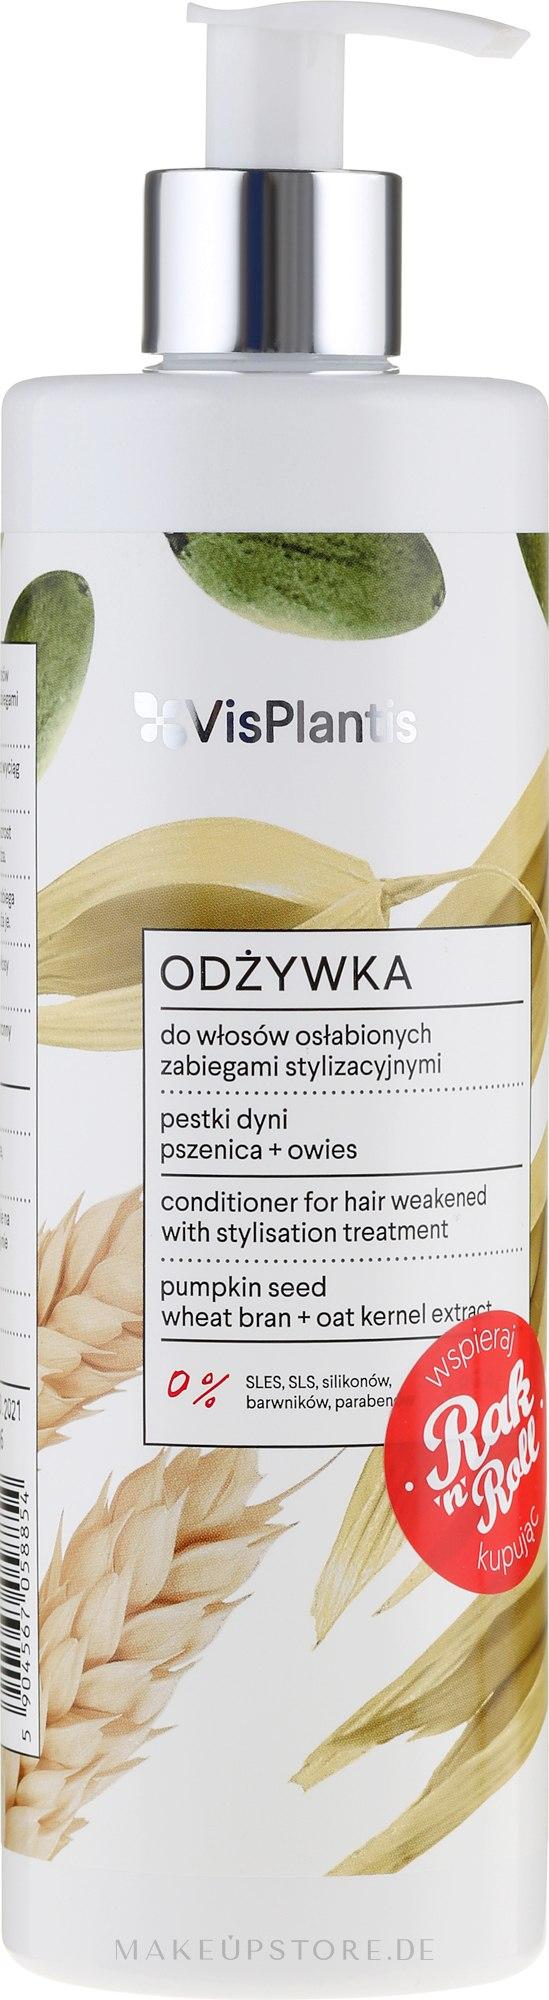 Haarspülung mit Kürbiskernöl - Vis Plantis Herbal Vital Care Conditioner Pumpkin Seed — Bild 400 ml